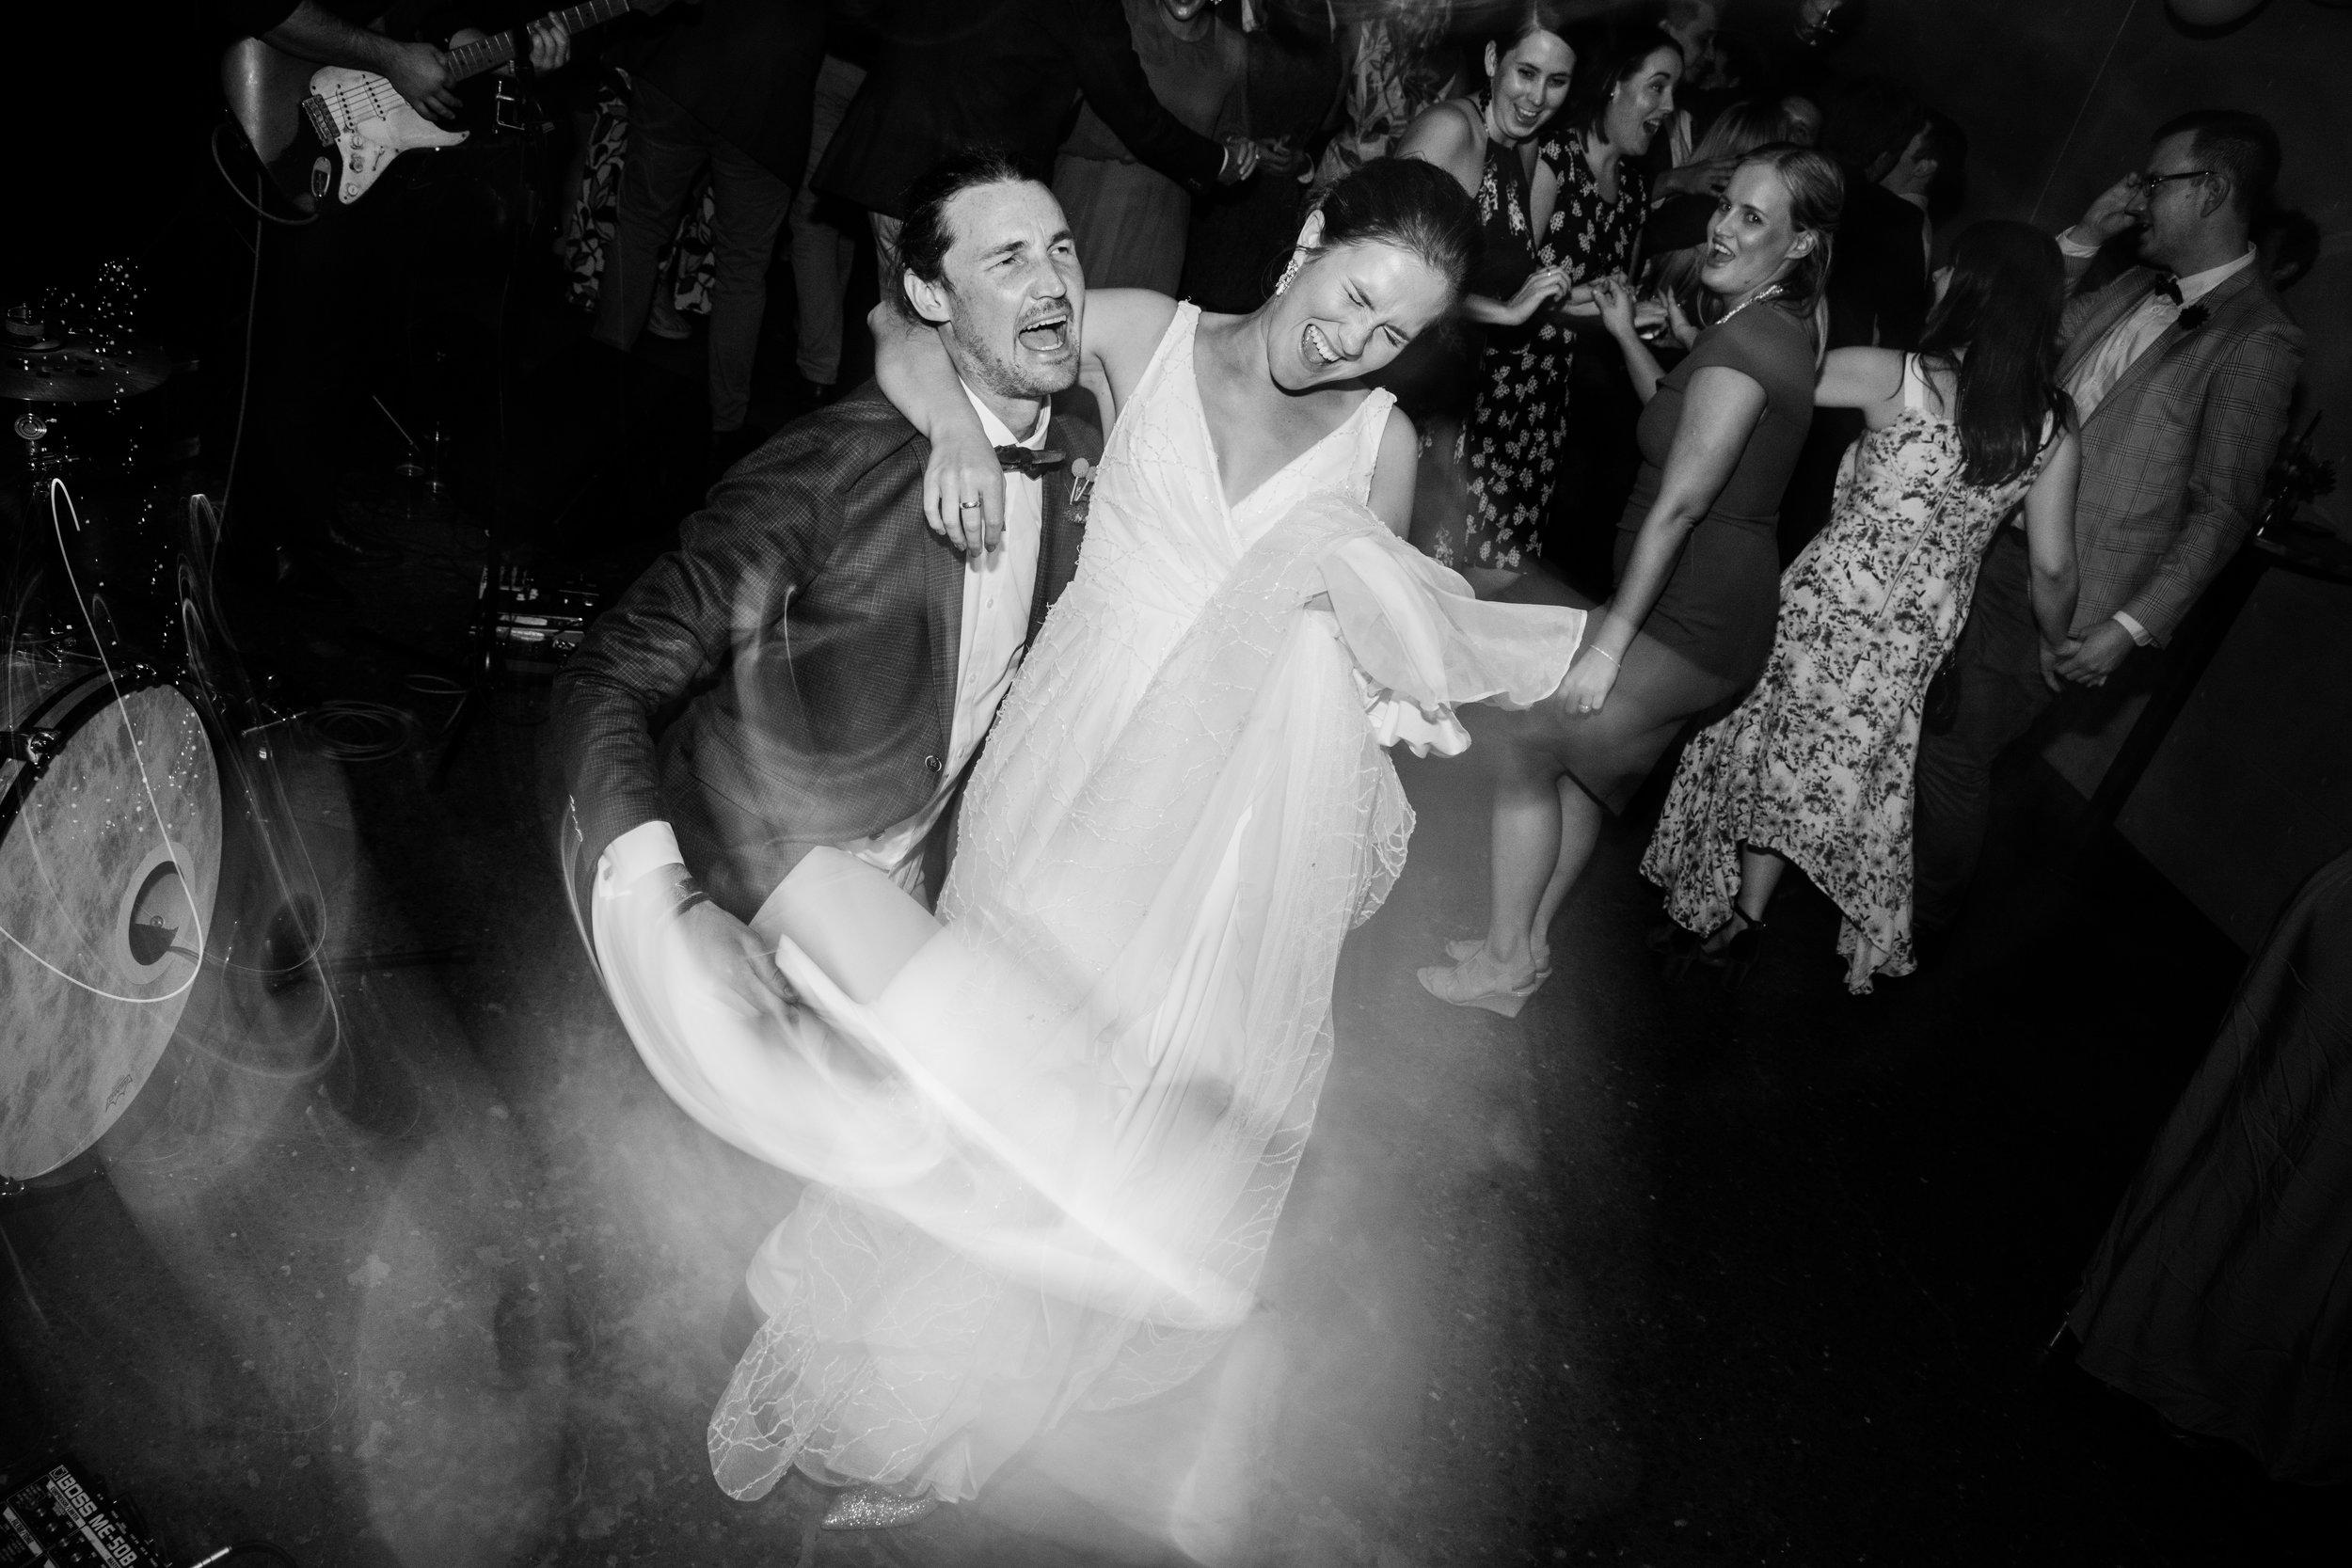 refinery-brisbane-wedding-reception-6.jpg